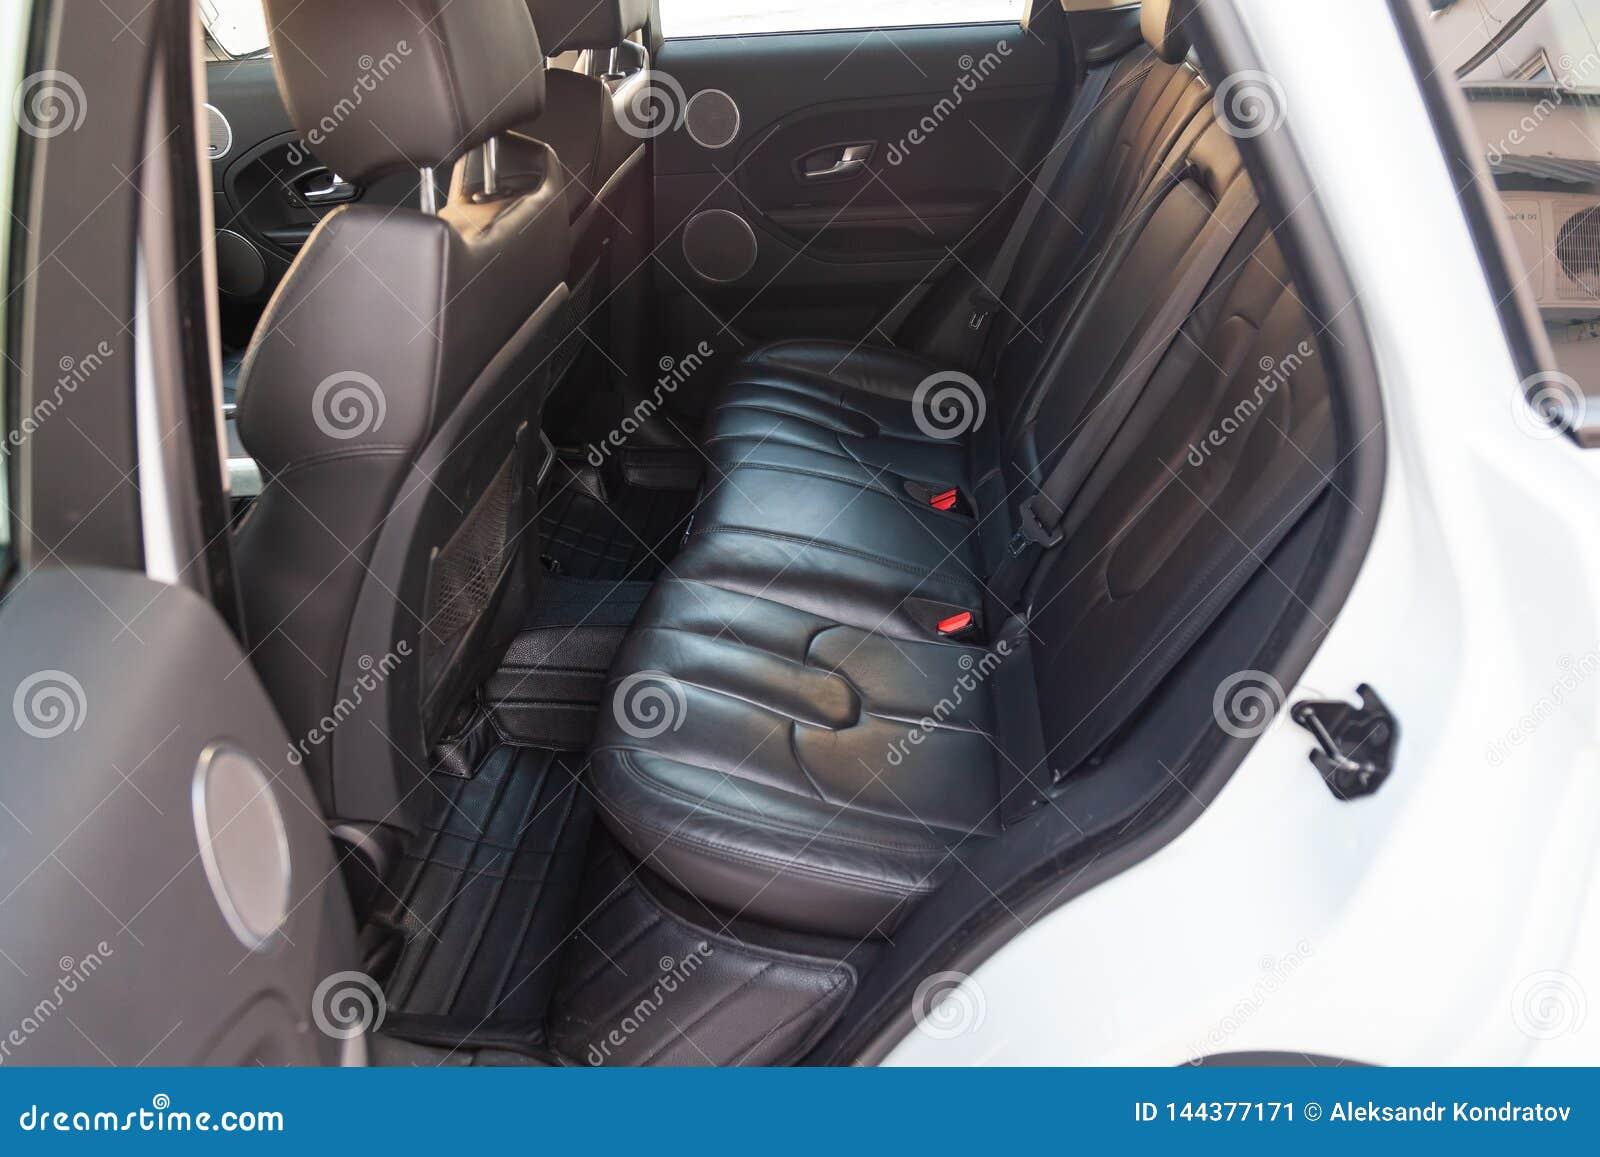 Vista ao interior da terra Rover Evoque com a porta traseira aberta e dos assentos após a limpeza antes da venda no estacionament